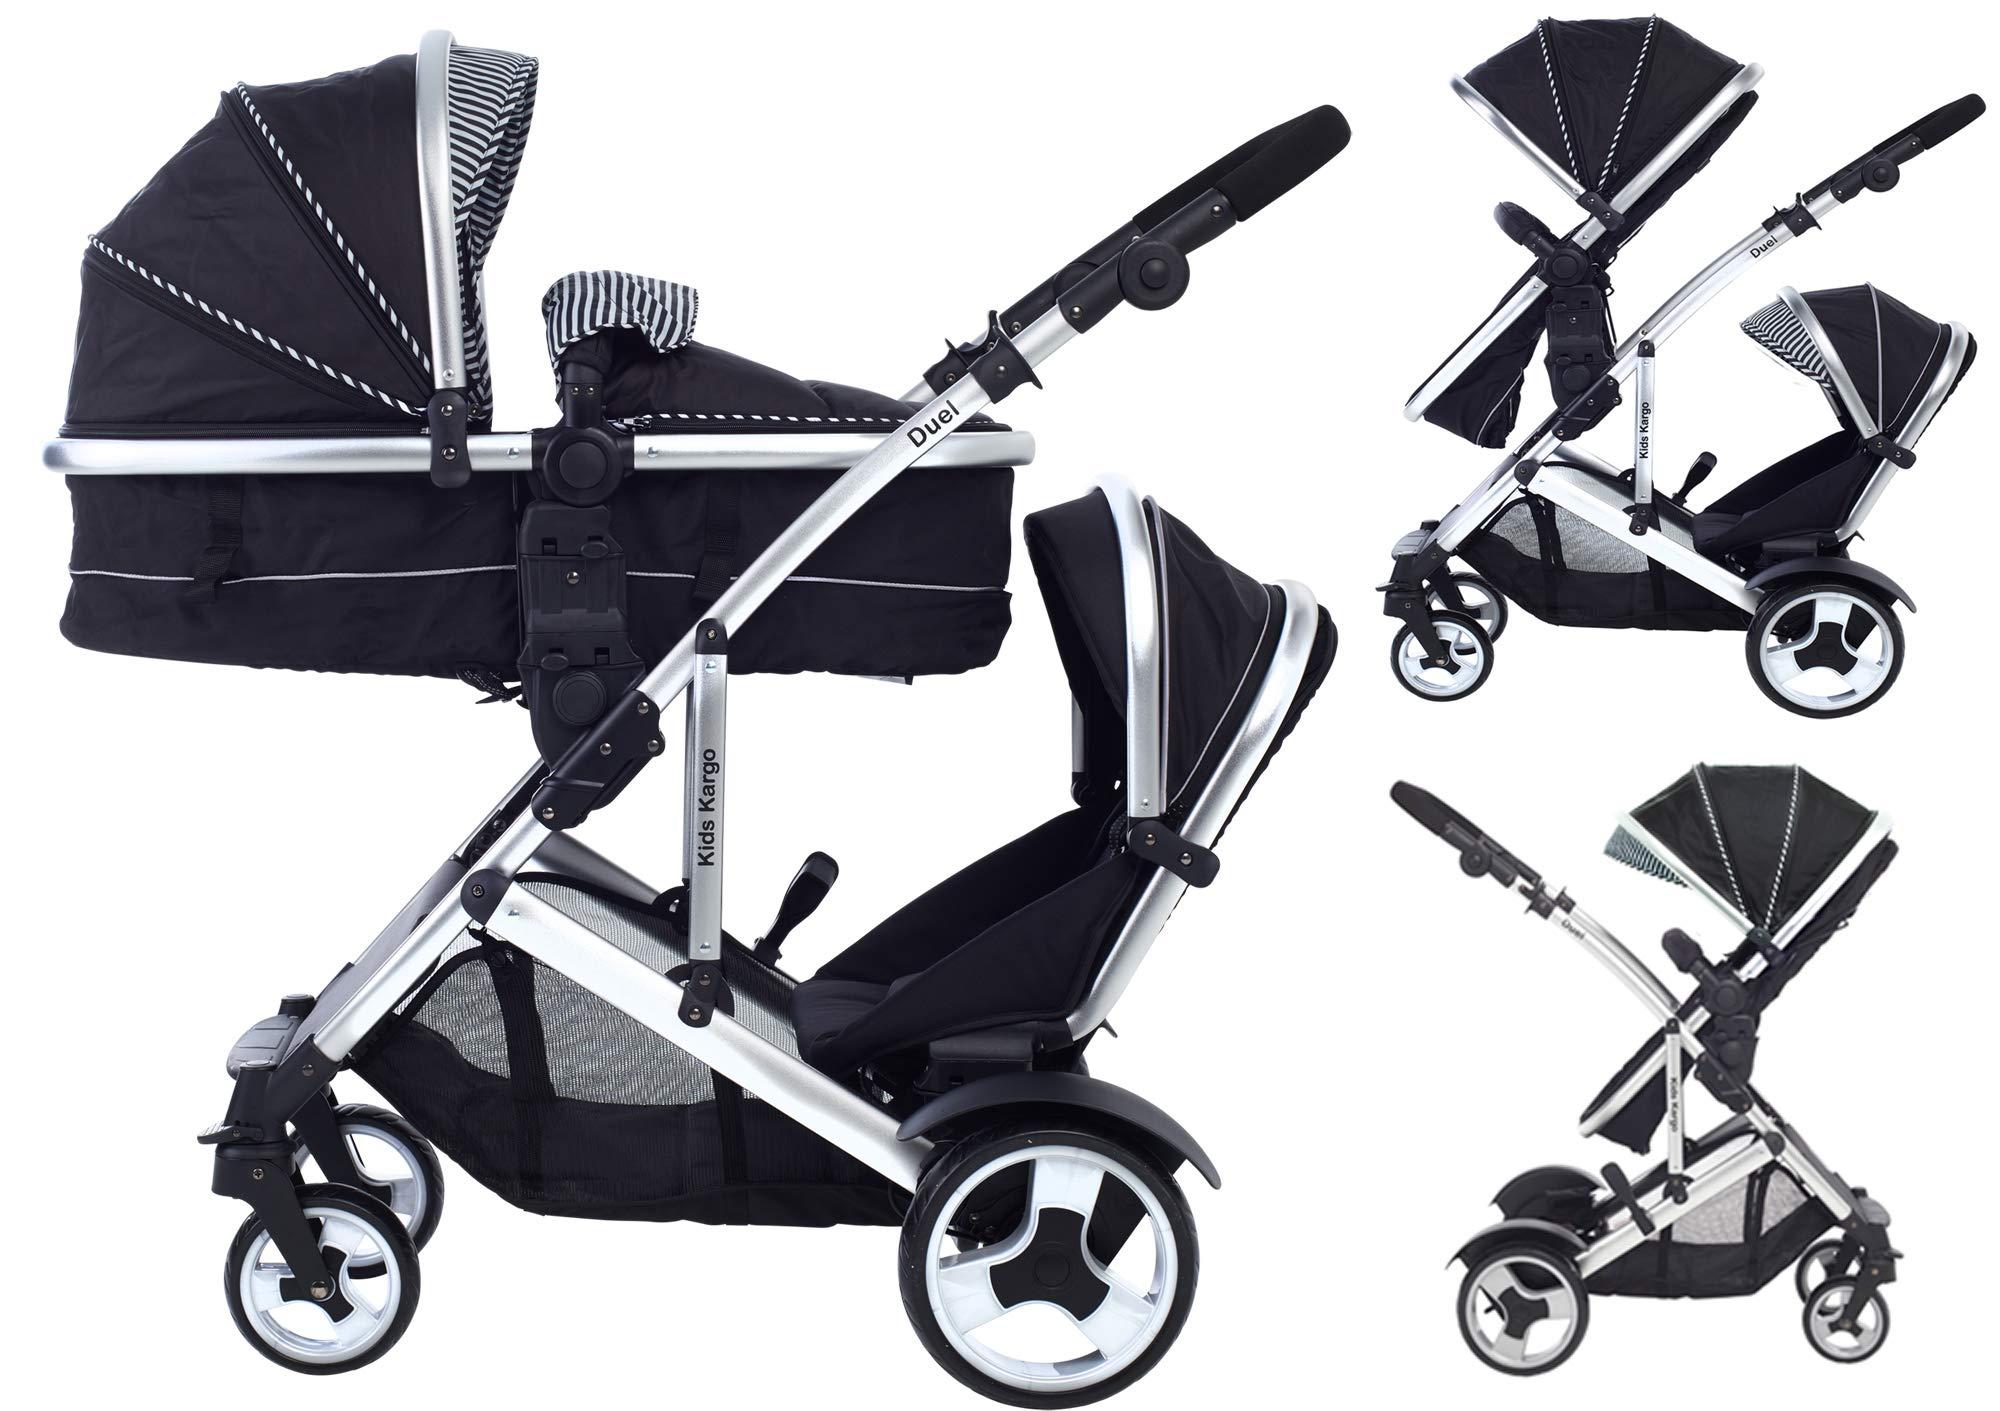 Kids Kargo Duel DS Doppel Einzel Kinderwagen Tandem Trageschale Doppel